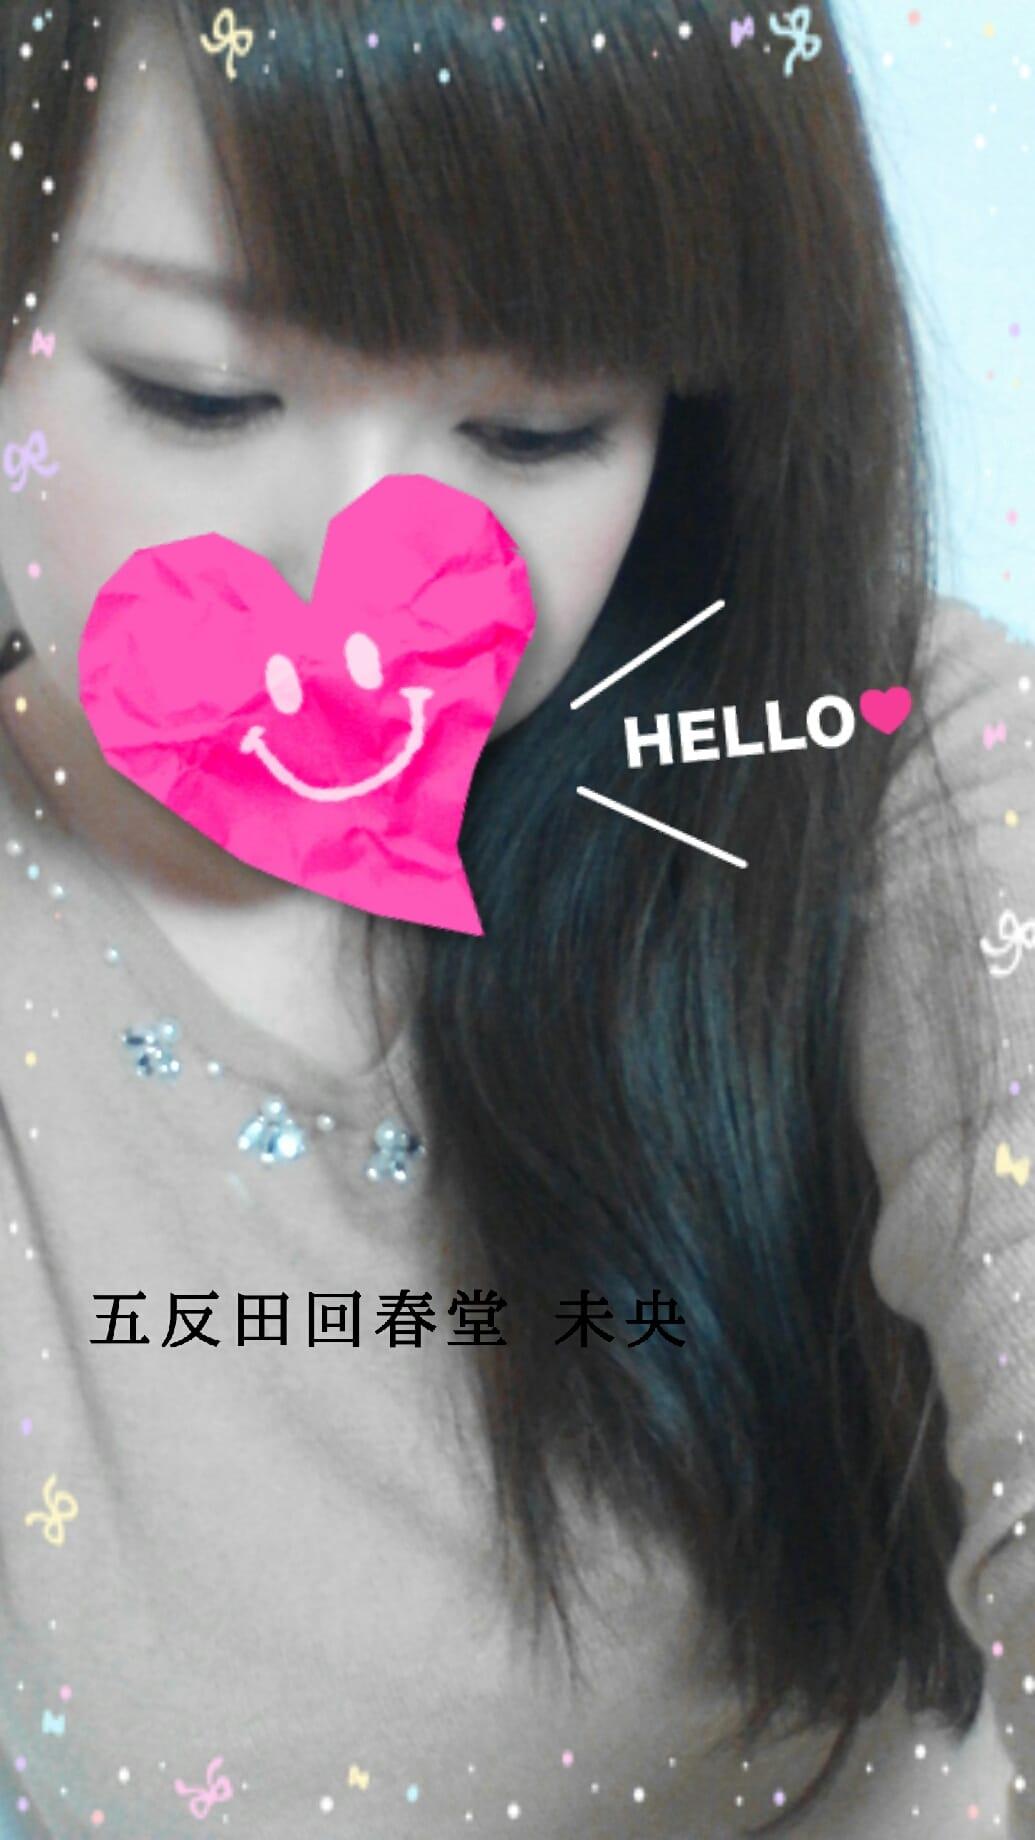 「4/19MさまThank you♪」04/20日(金) 14:41 | 未央-みお-の写メ・風俗動画